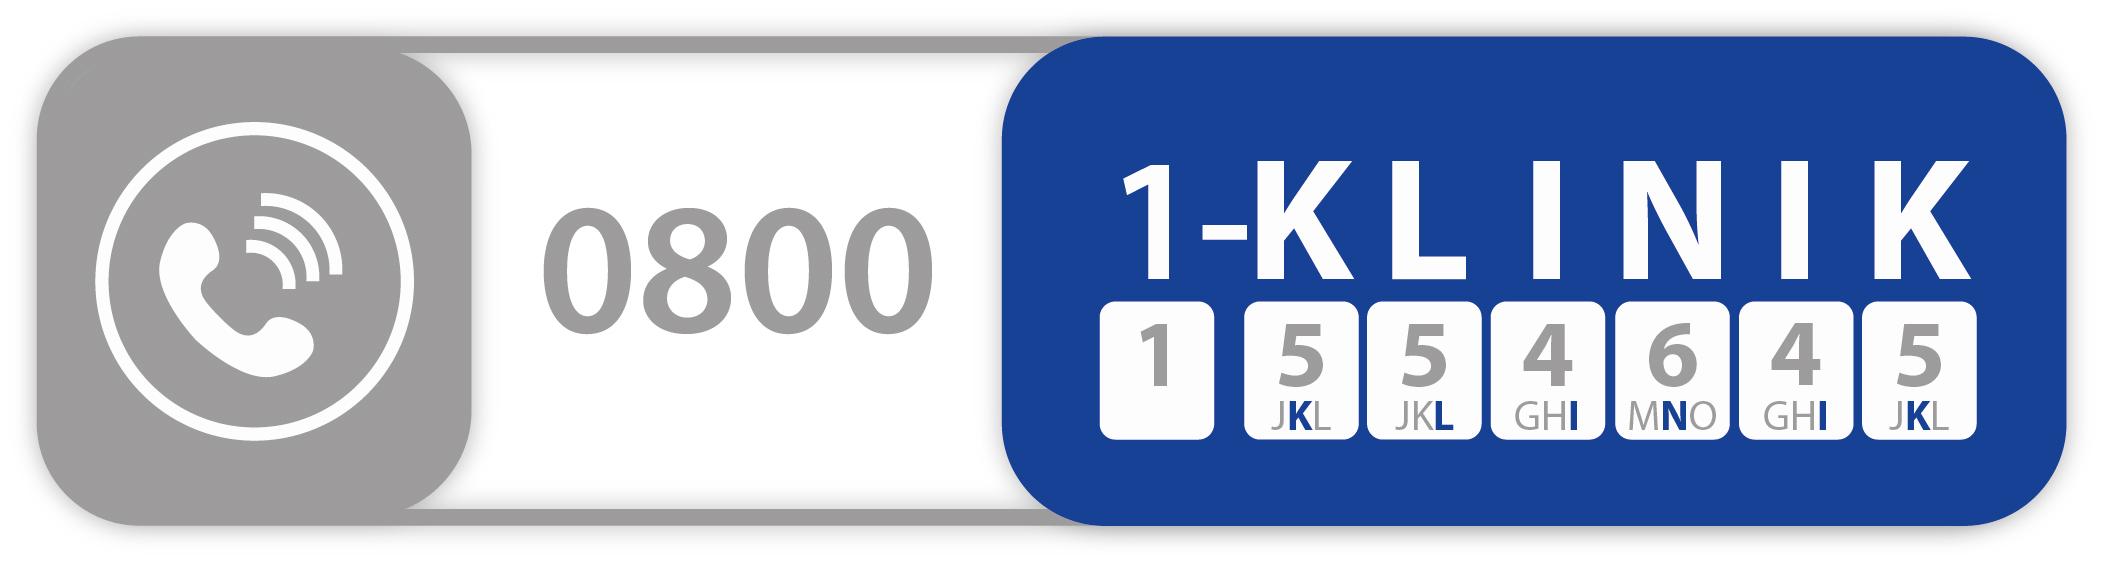 Logo-Tel-Nr.